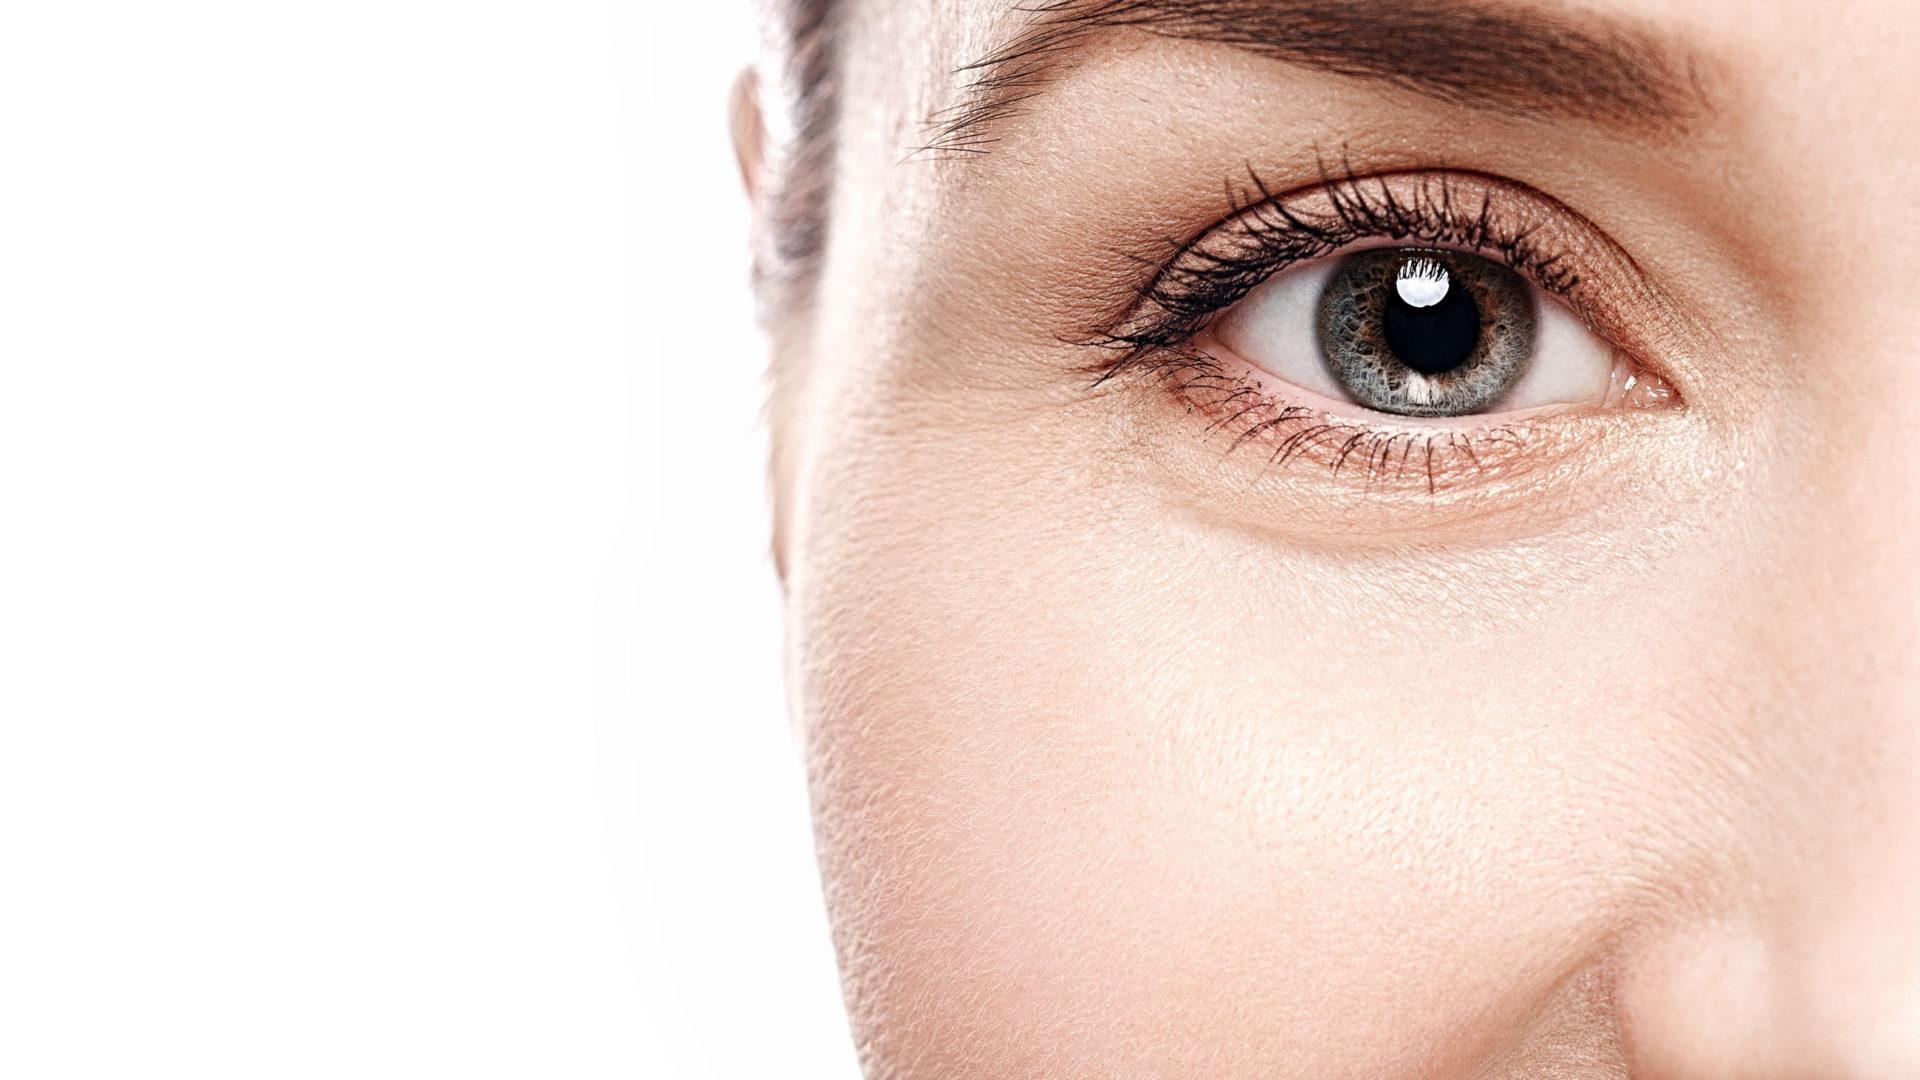 Natural Eye Woman Eyebrow Eyes Lashe